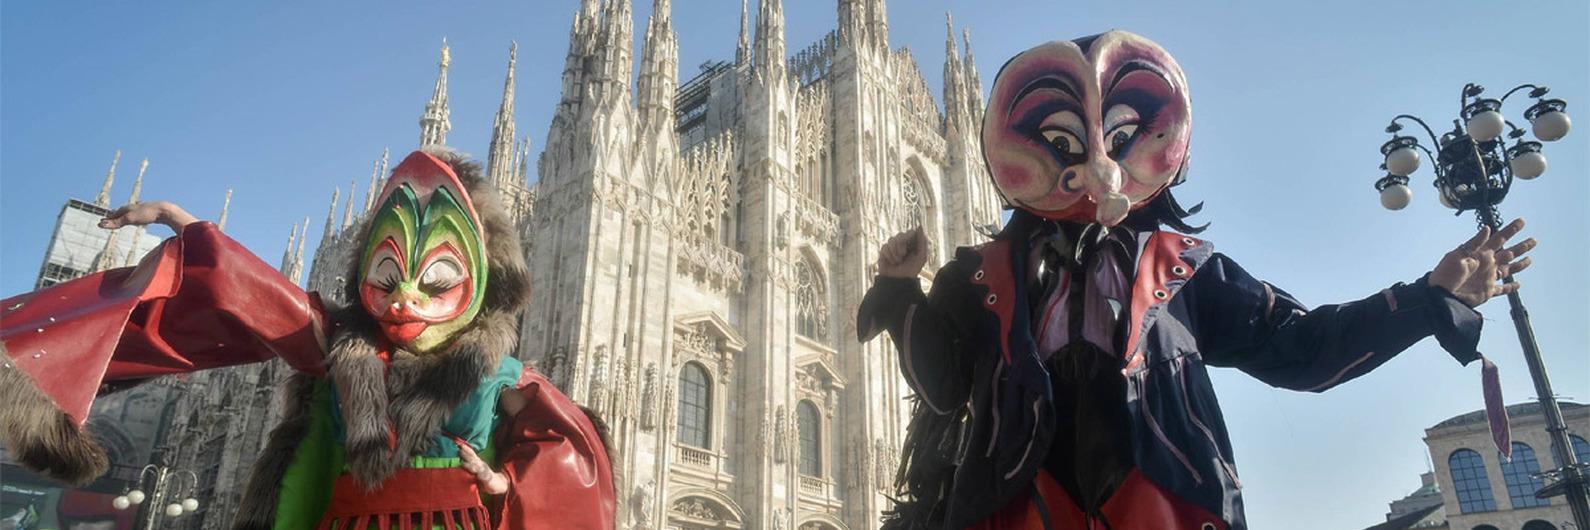 Descubra o 'Carnavale Ambrosiano'